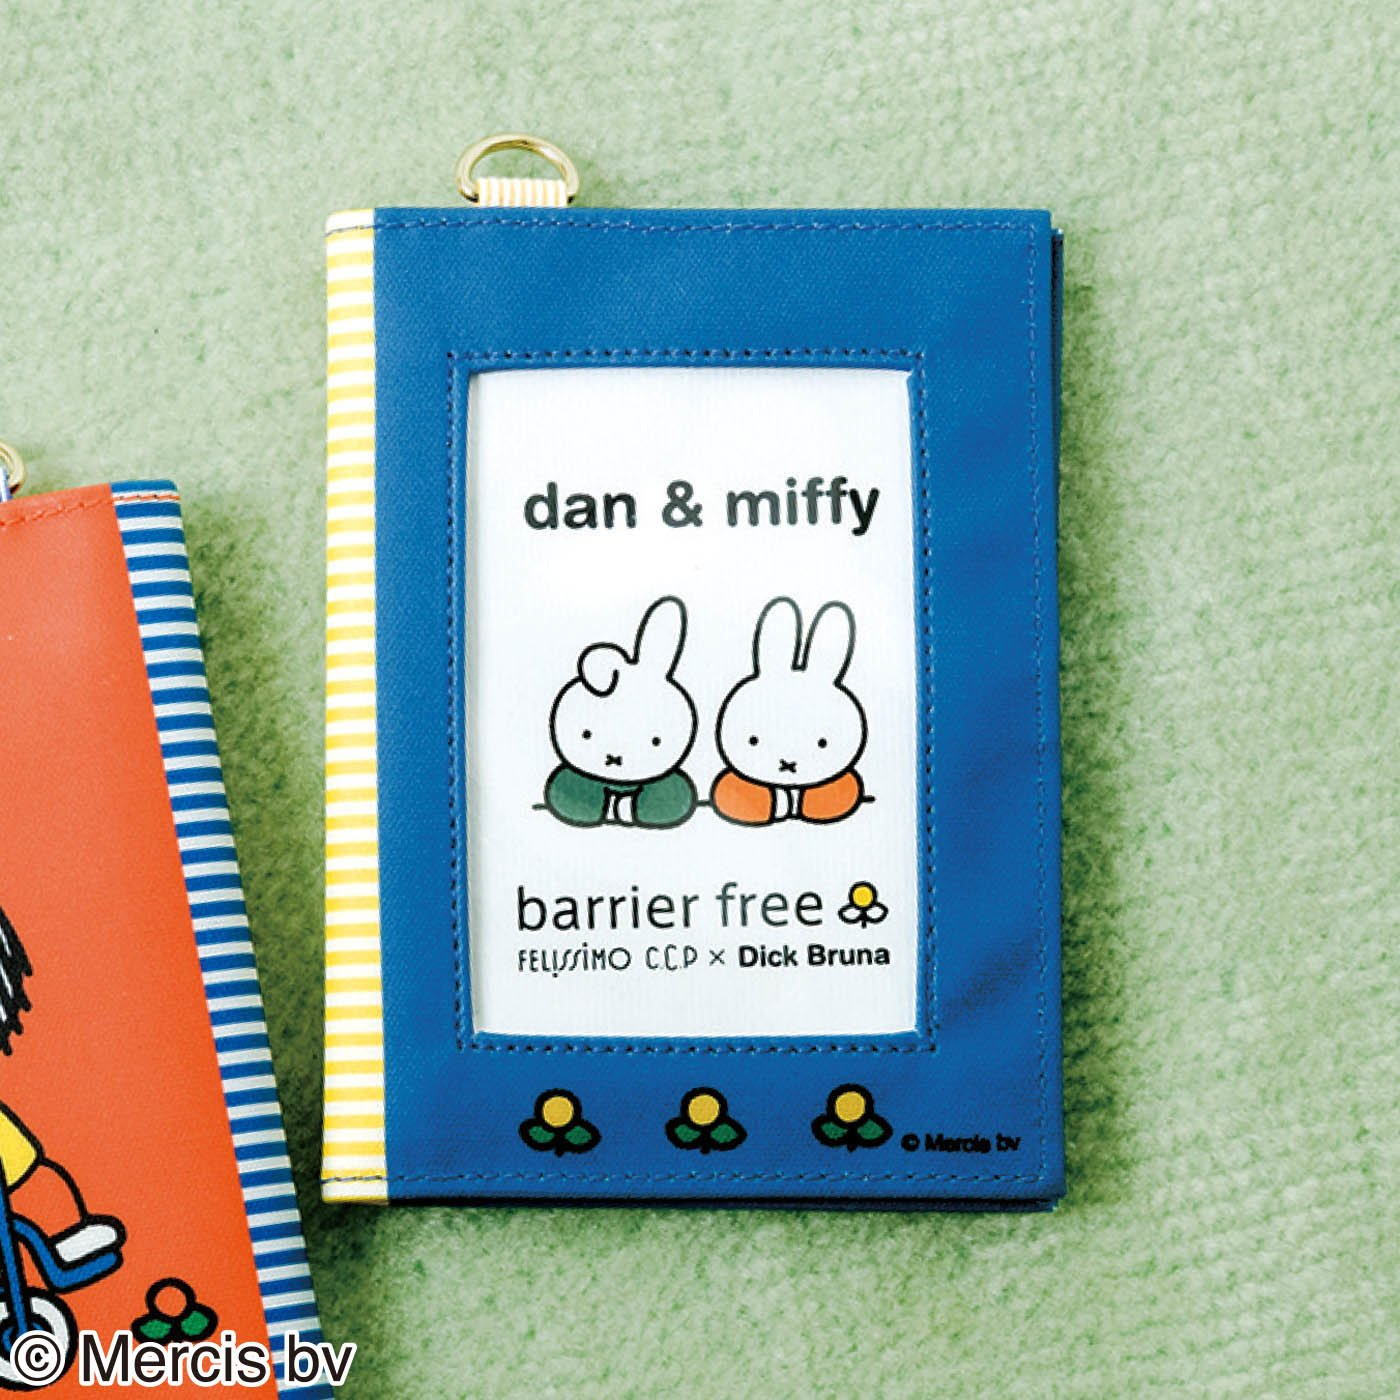 CCP×ディック・ブルーナ バリアフリー 両面窓の手帳ケース 〈ダーン&ミッフィー〉